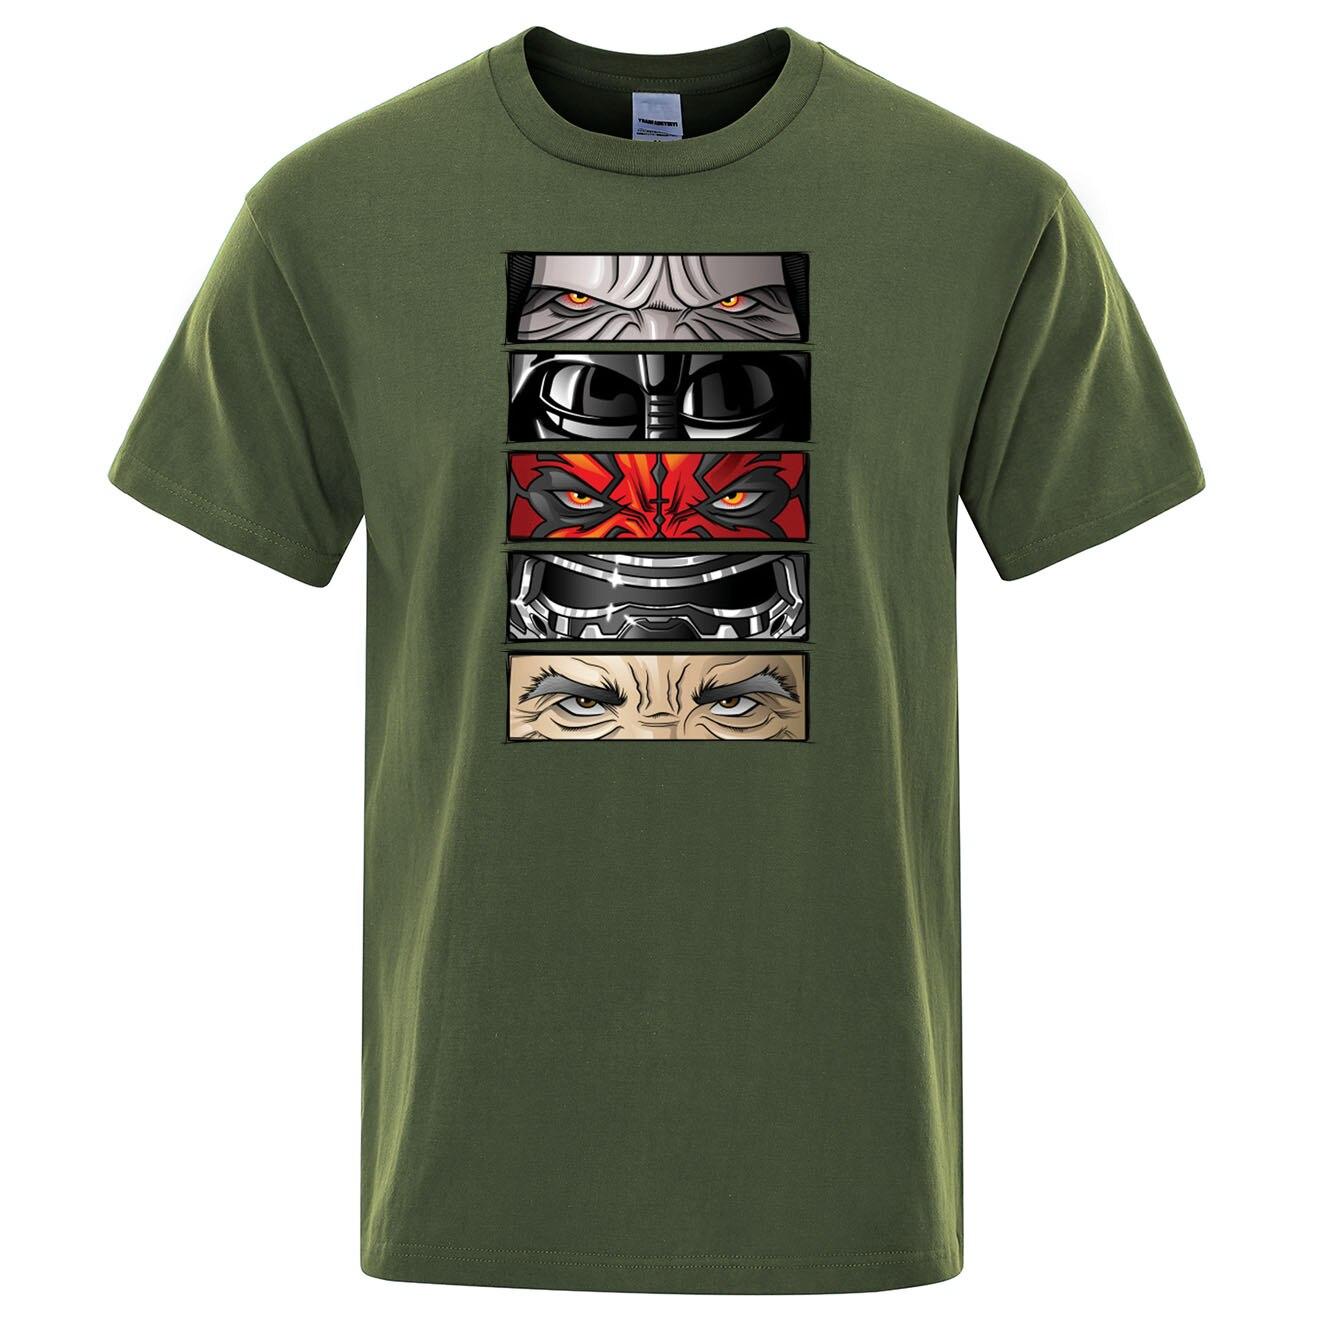 Eyes Of Dark Print Mens T Shirt Movies Short Sleeve Men T-Shirt Summer Cotton Tops Men T Shirts Harajuku Streetwear Tee Shirt